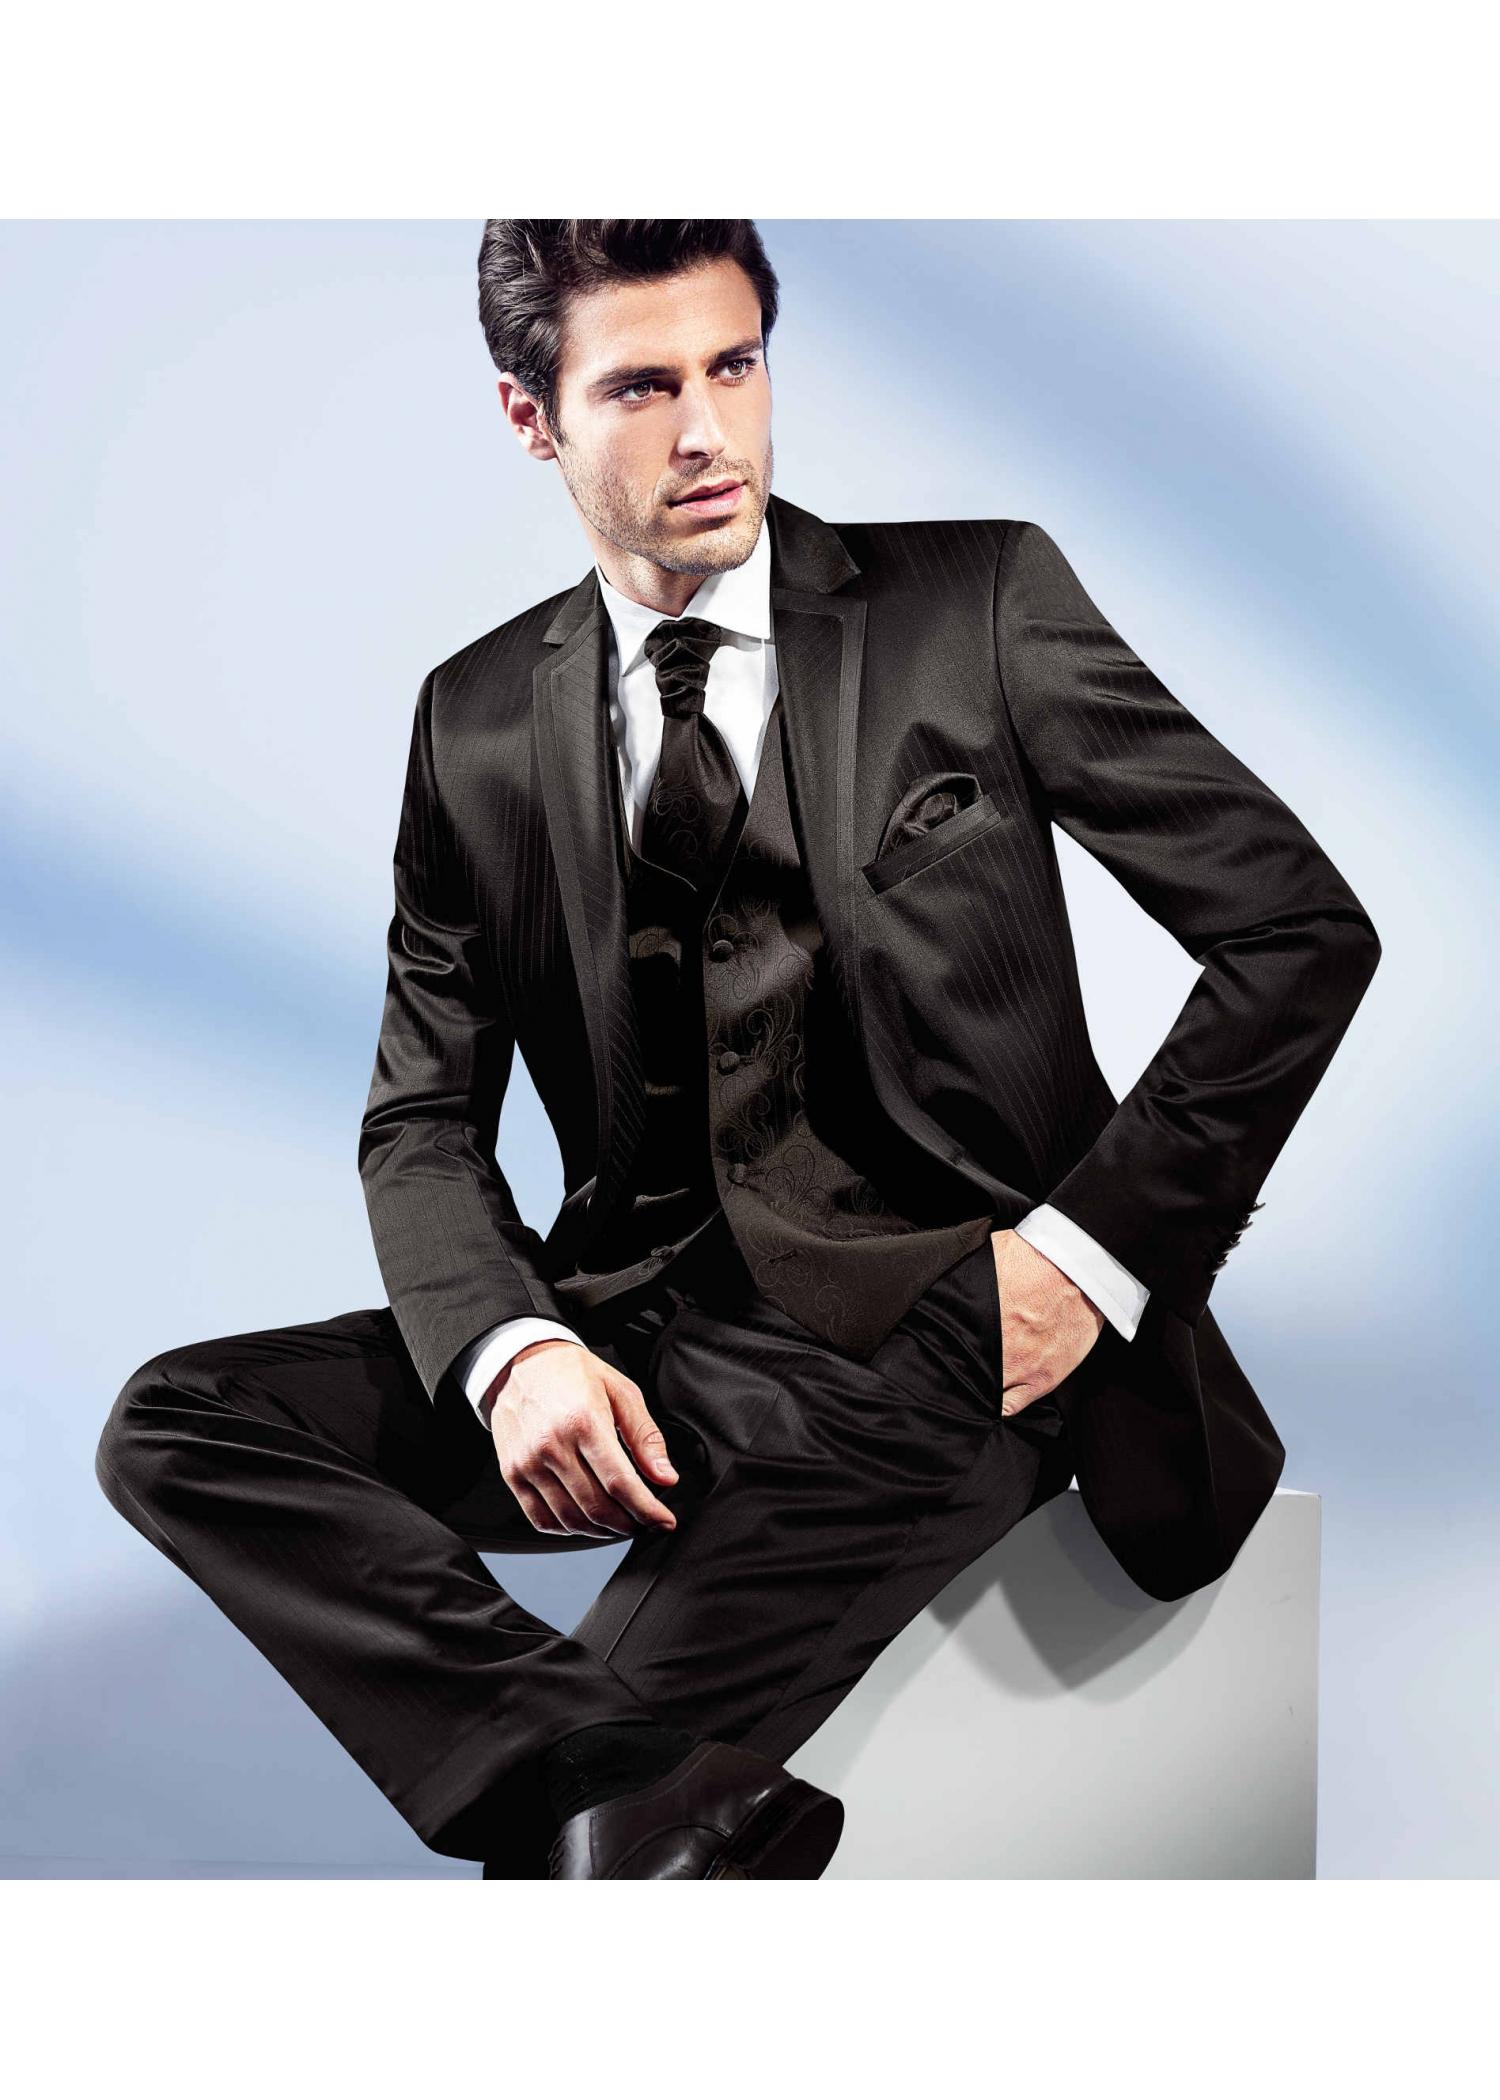 Benetti Suits at Tom Murphy Menswear